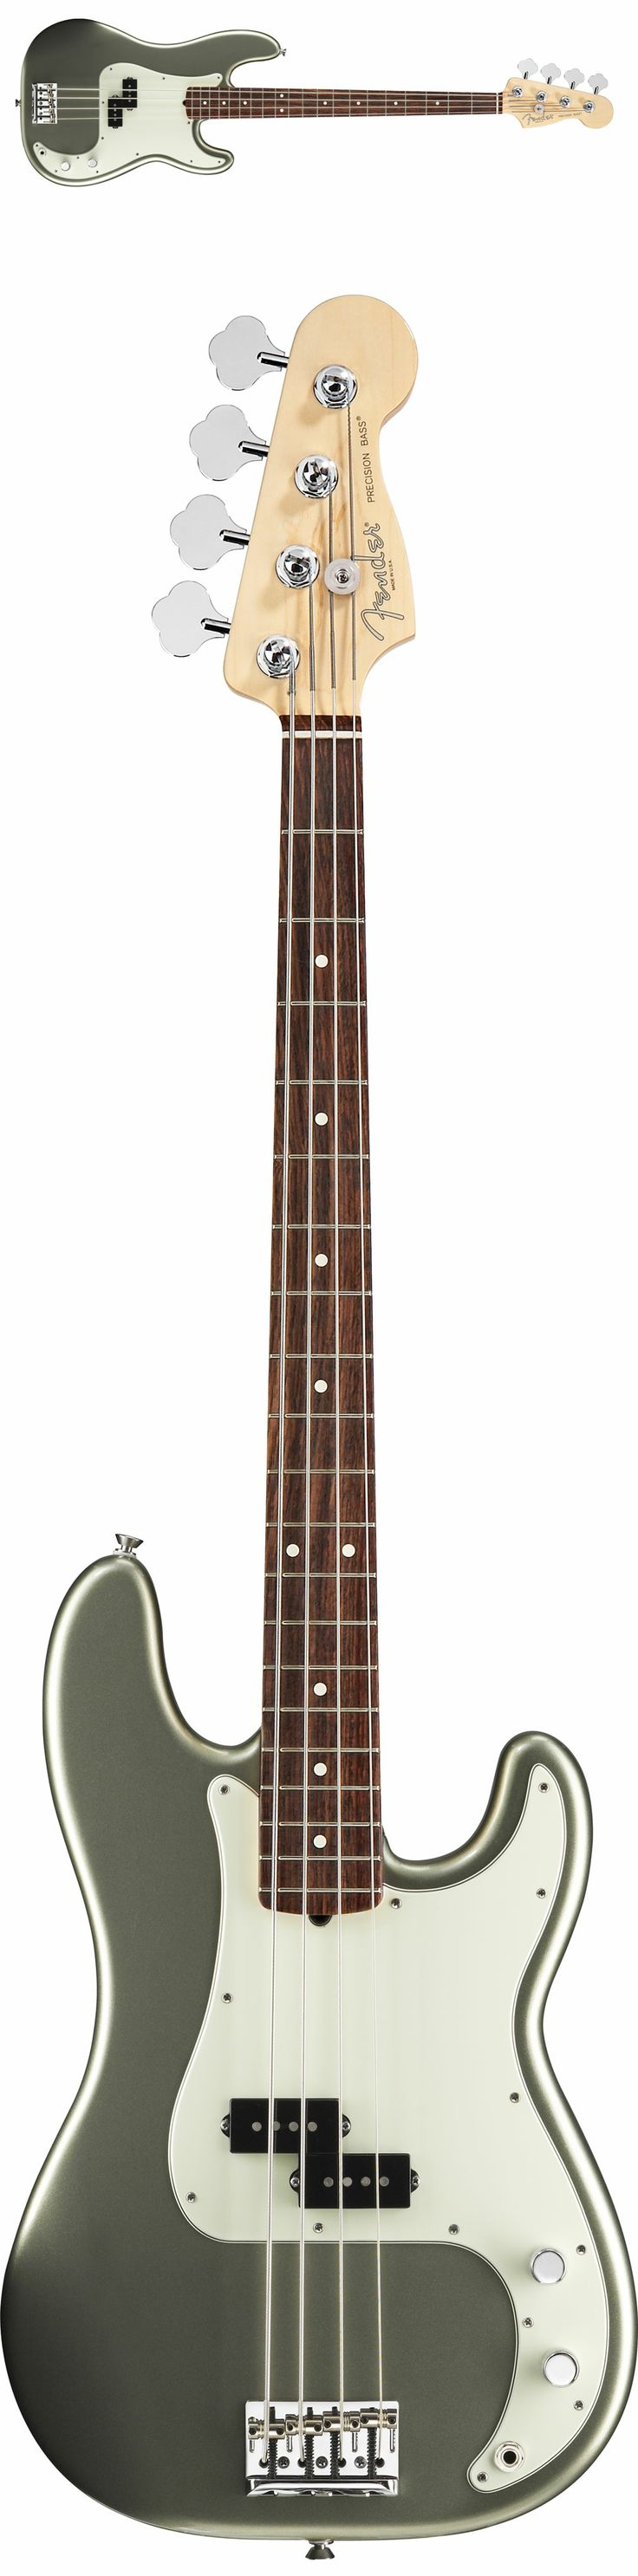 Fender American Standard Precision 4 String Bass Guitar 2012 Jade Pearl Rosewood